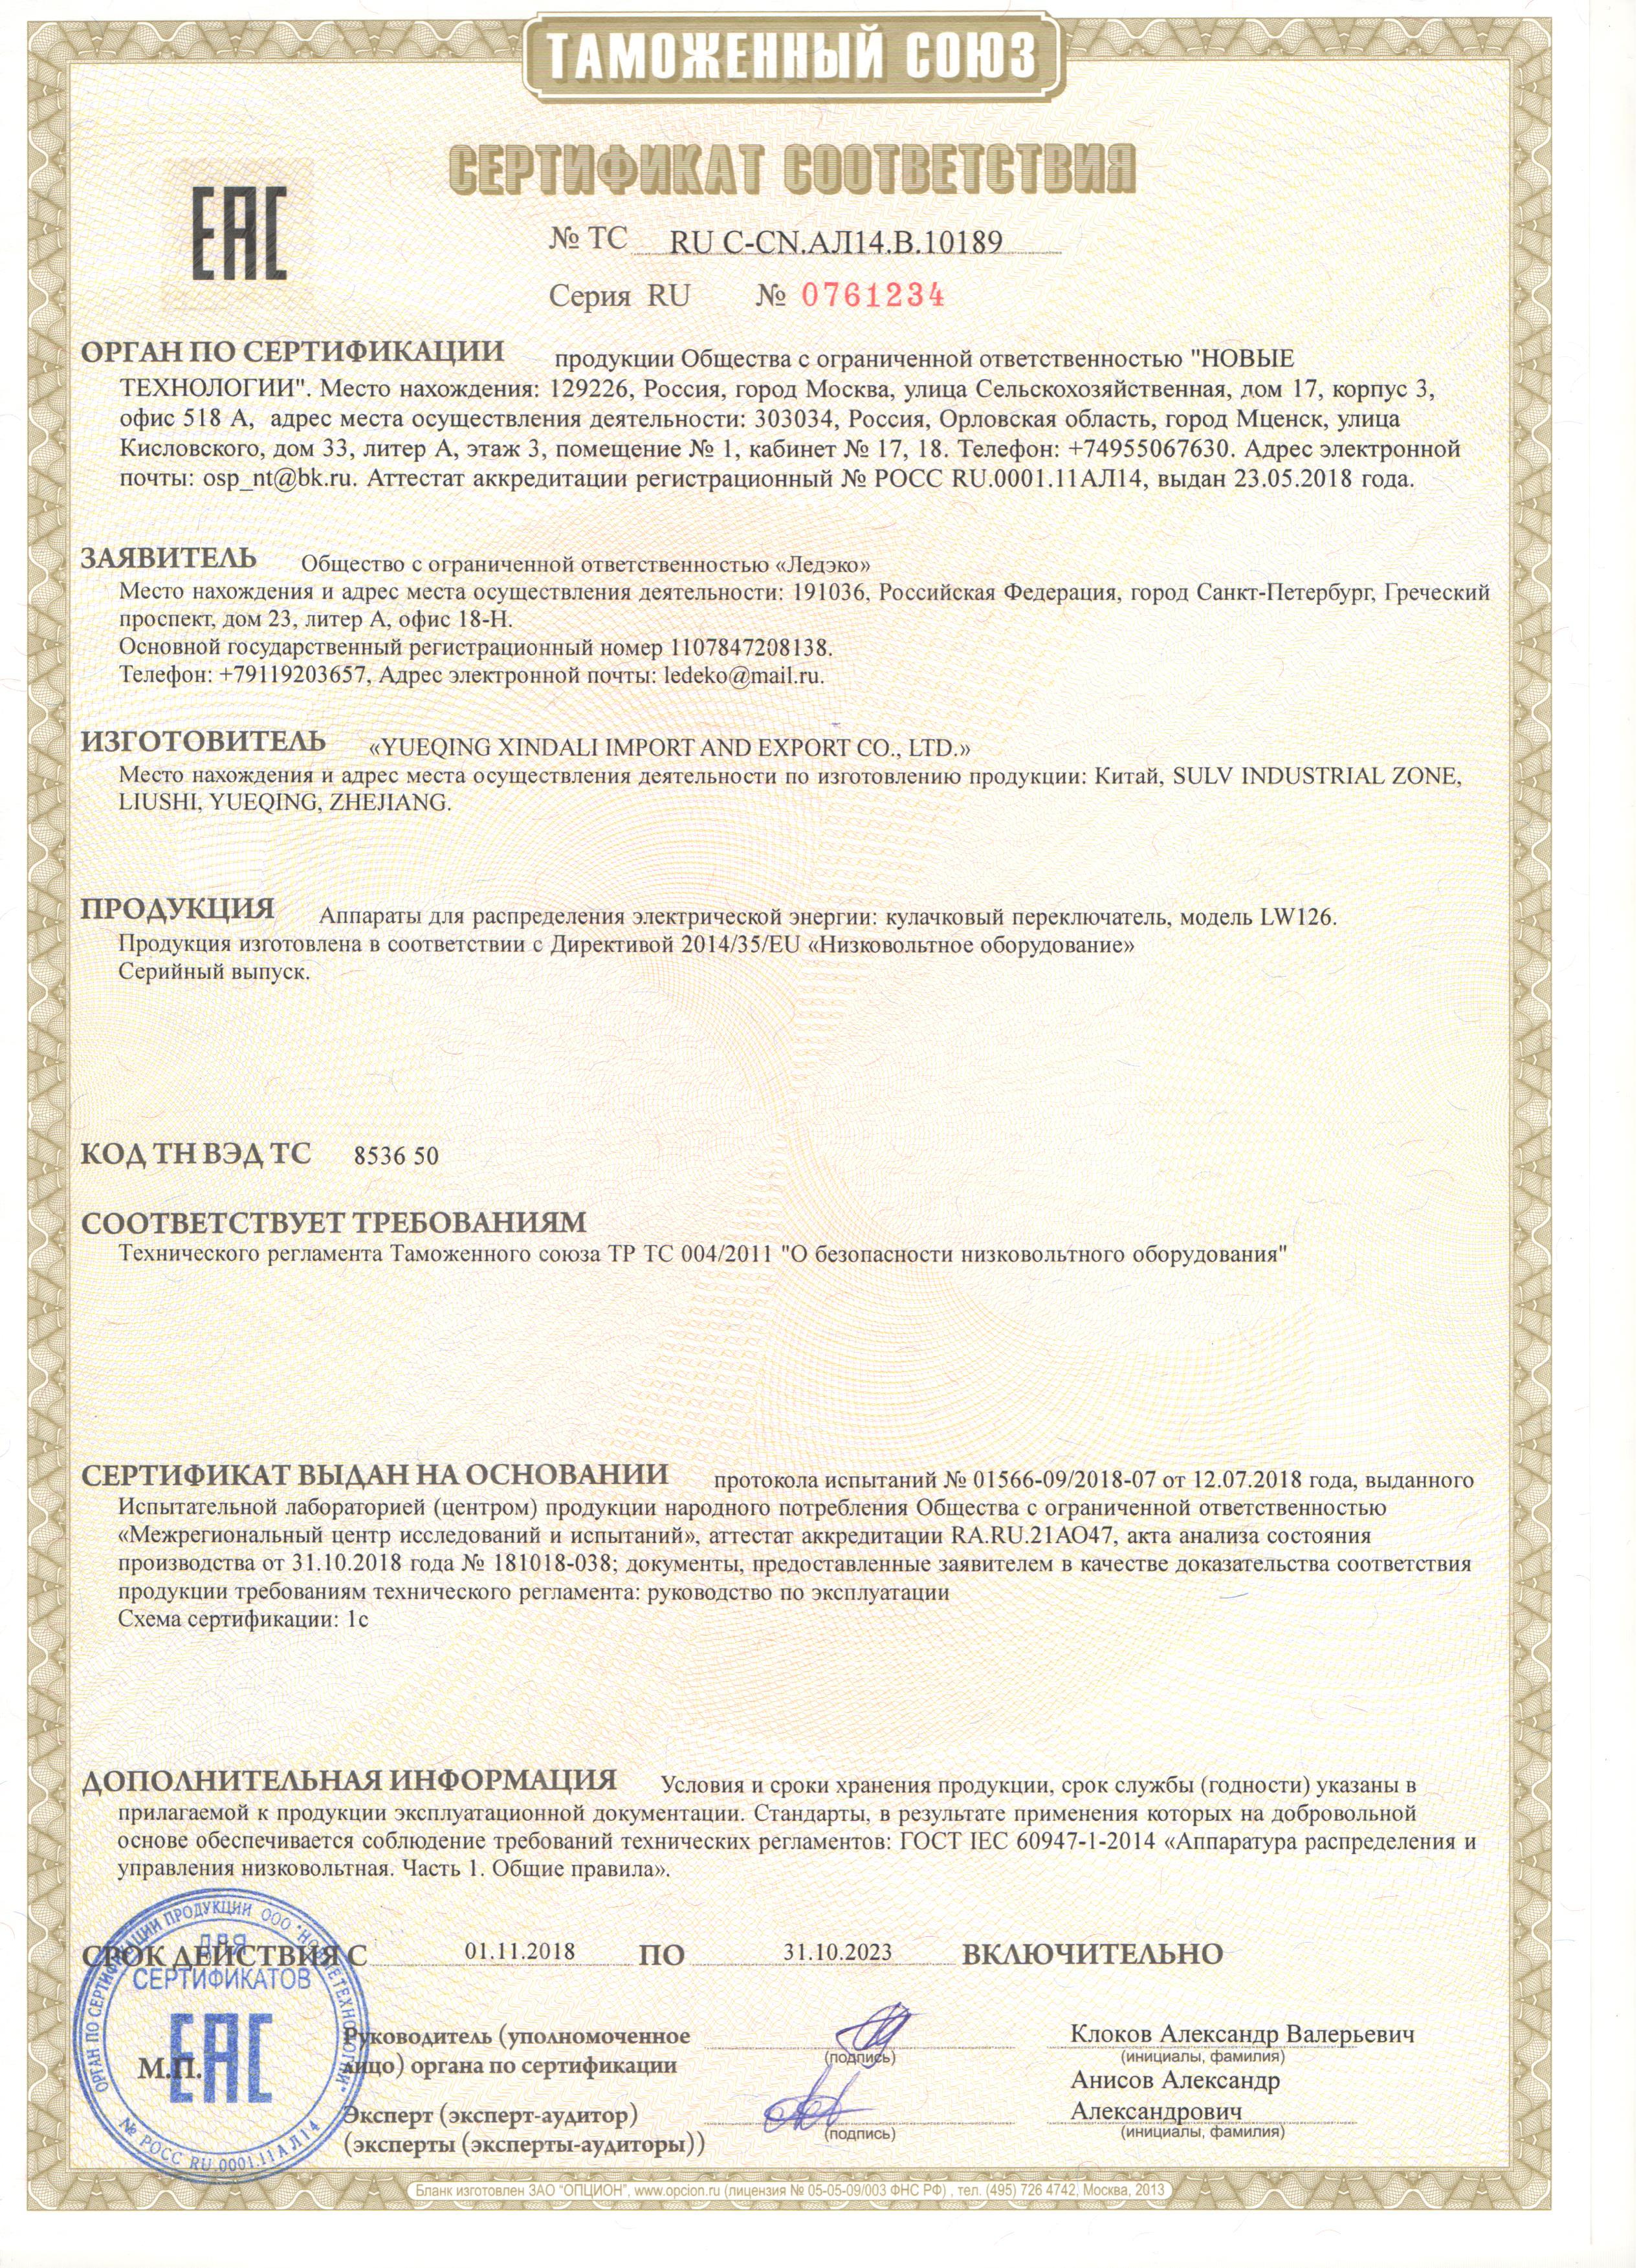 http://montagesystems.ru/files/Сертификат%20на%20Переключатели%20LW126%20до%2031.10.2023.jpeg